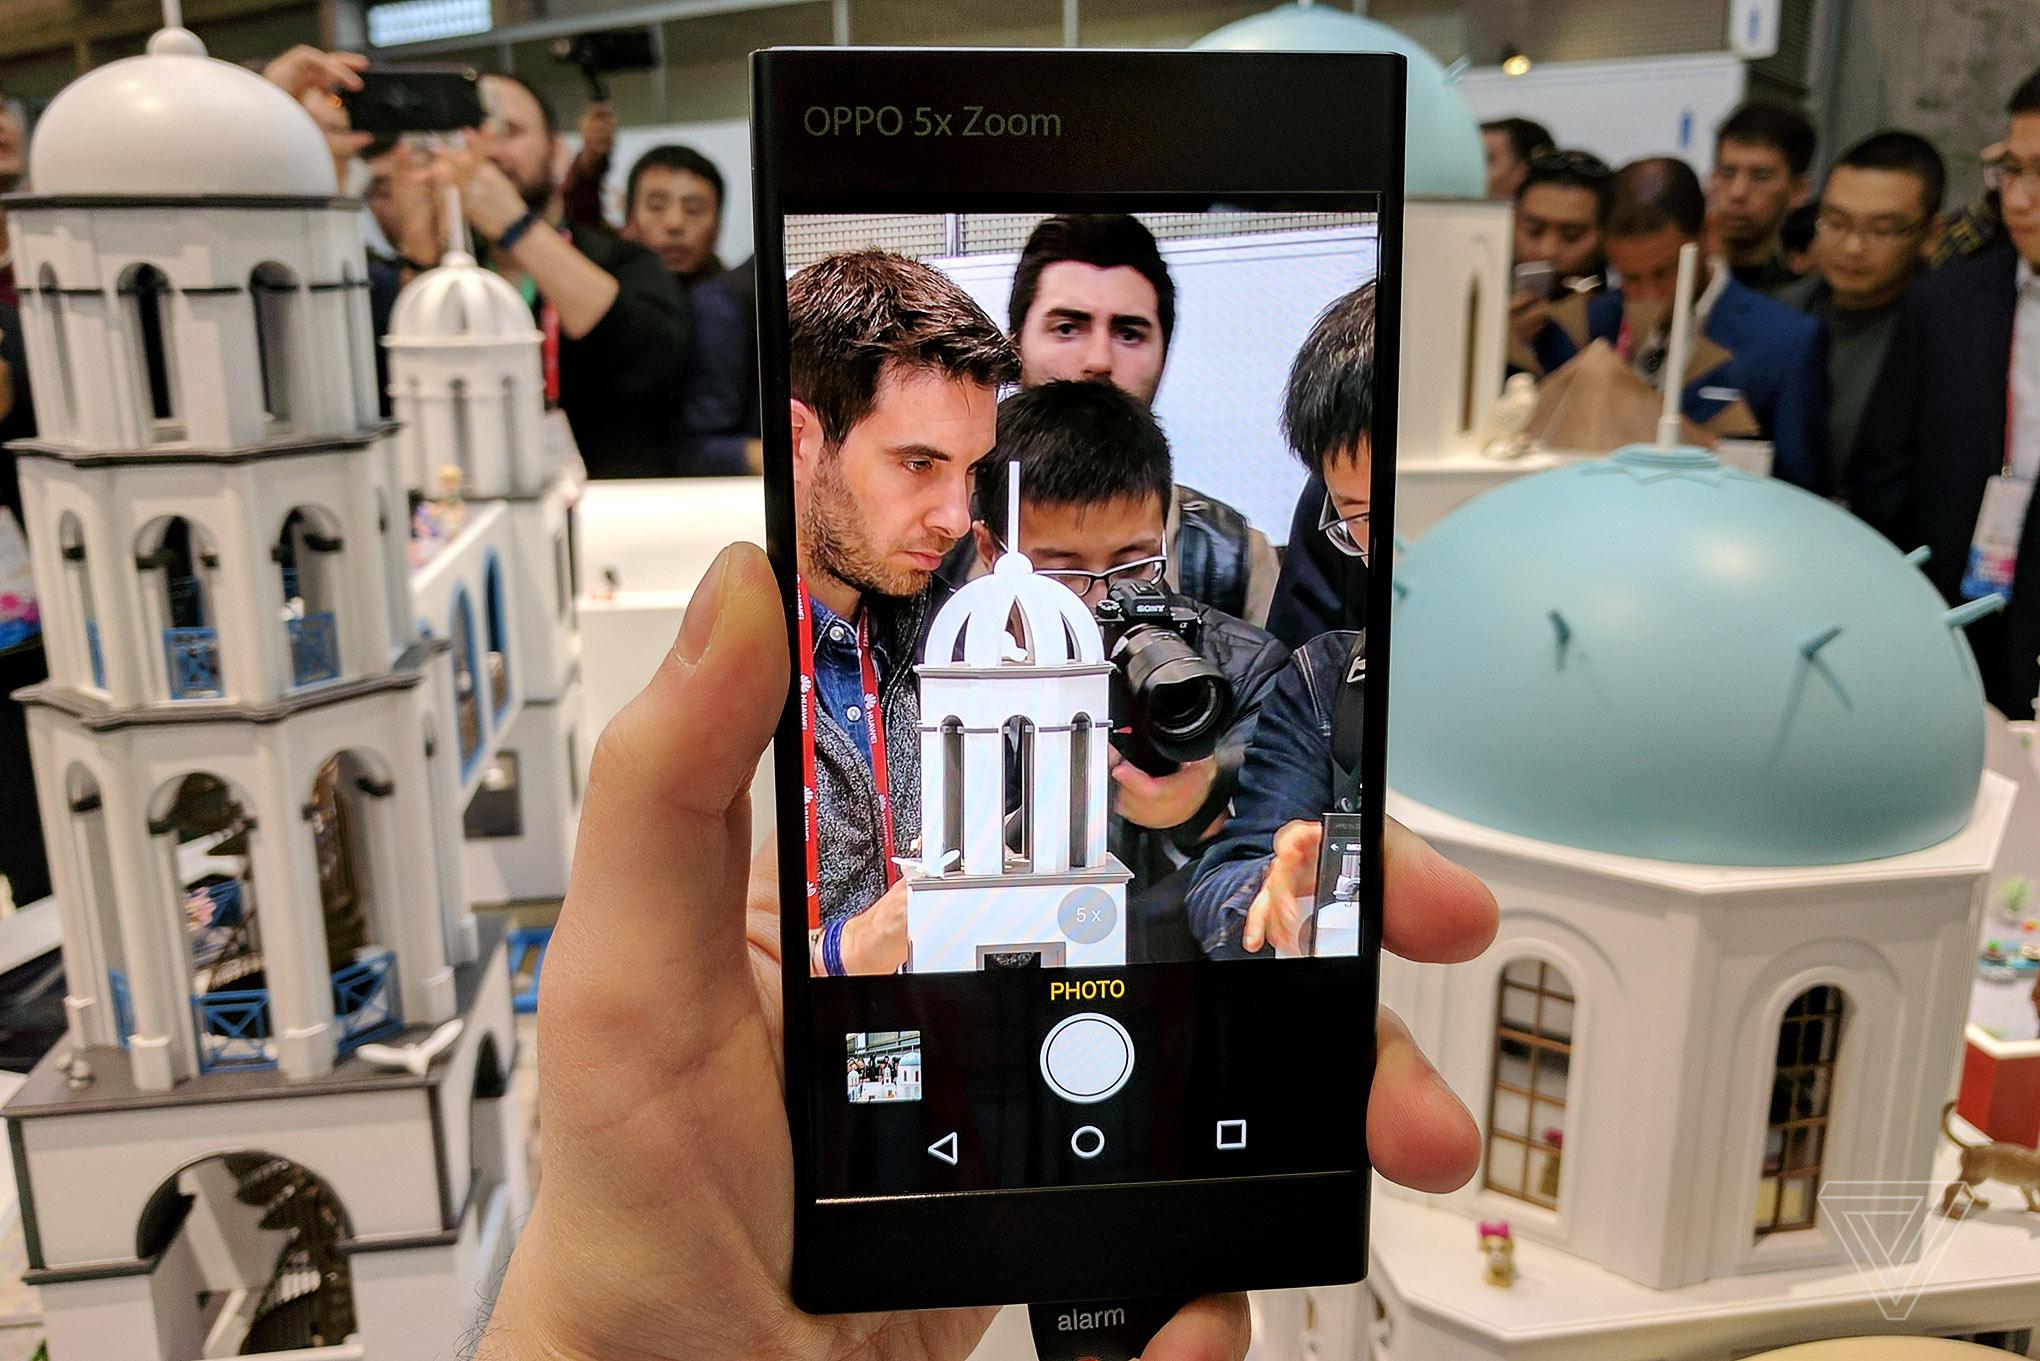 oppo s 5x zoom camera is an ingenious prototype that